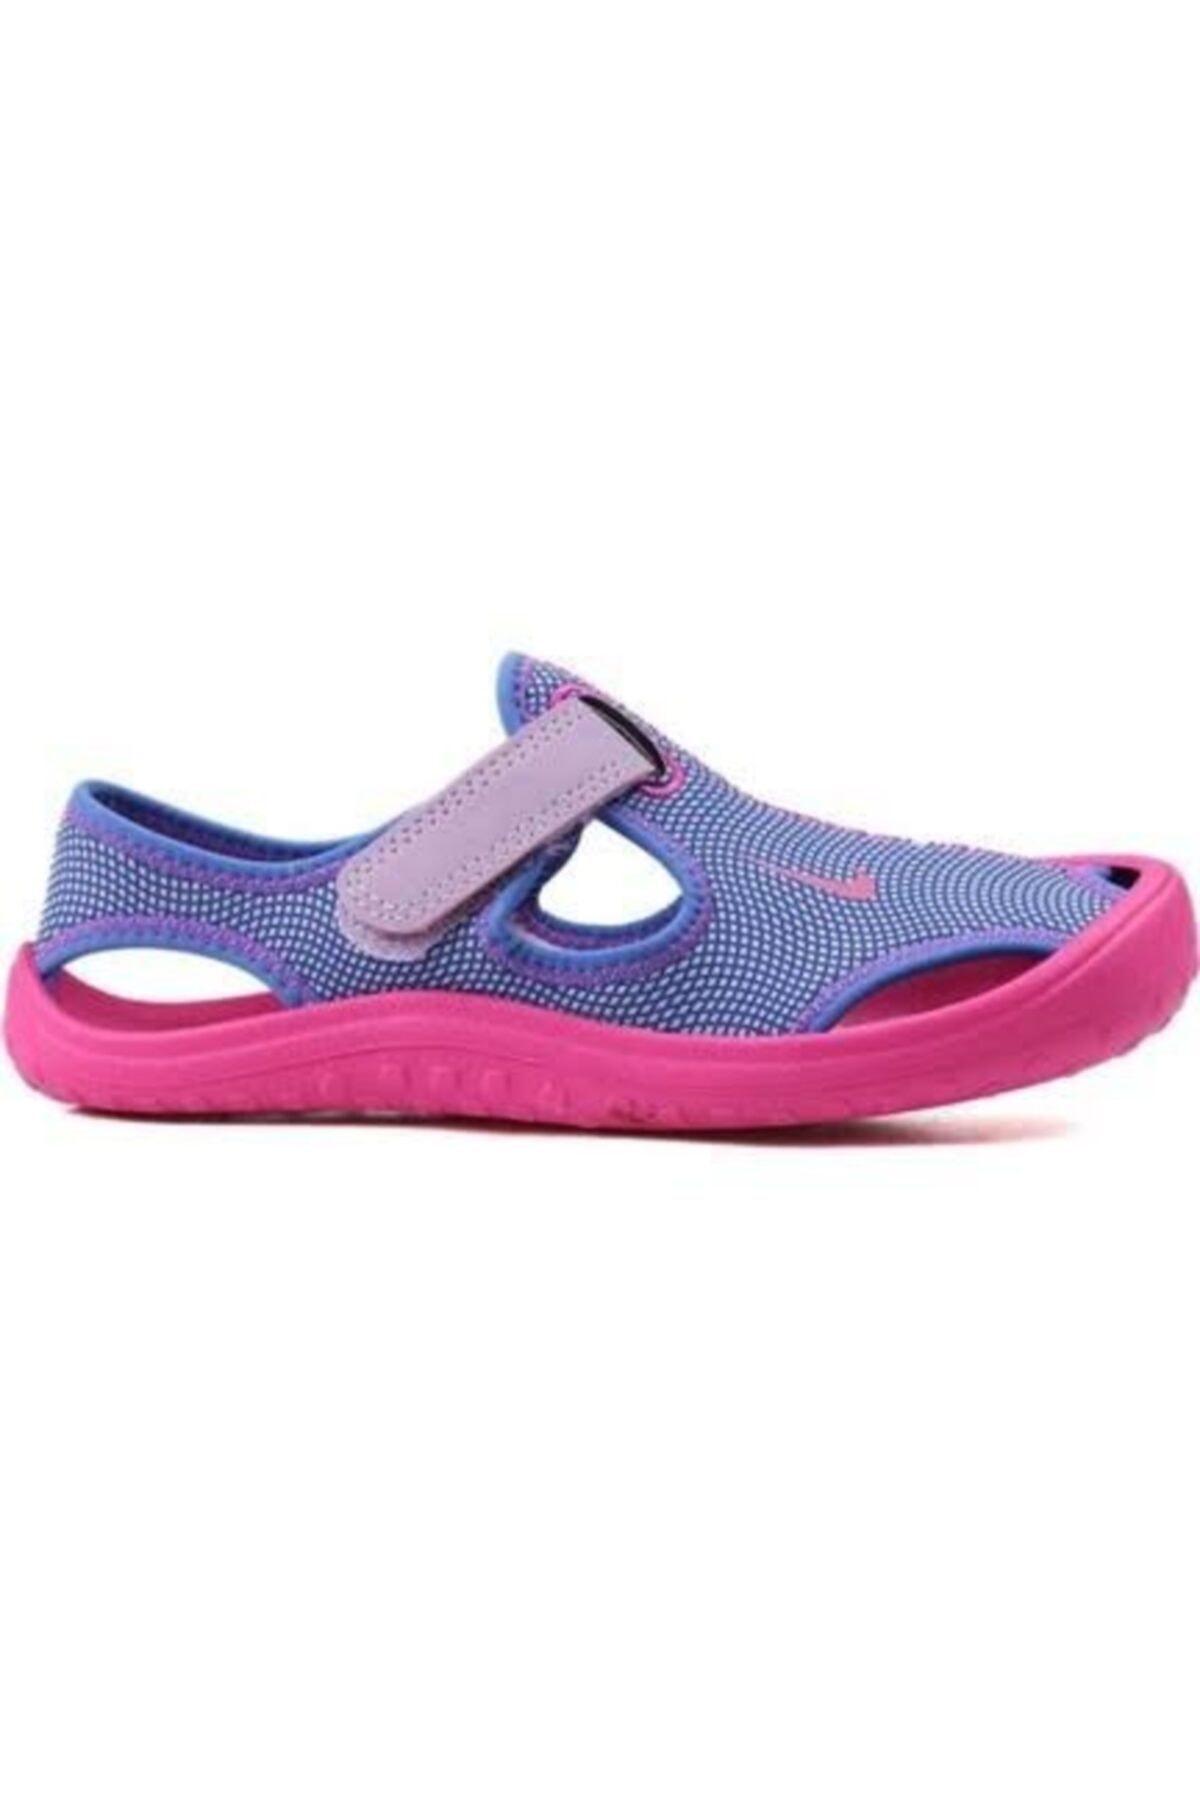 Nike Sunray Protect Çocuk Sandalet 903633-500 1